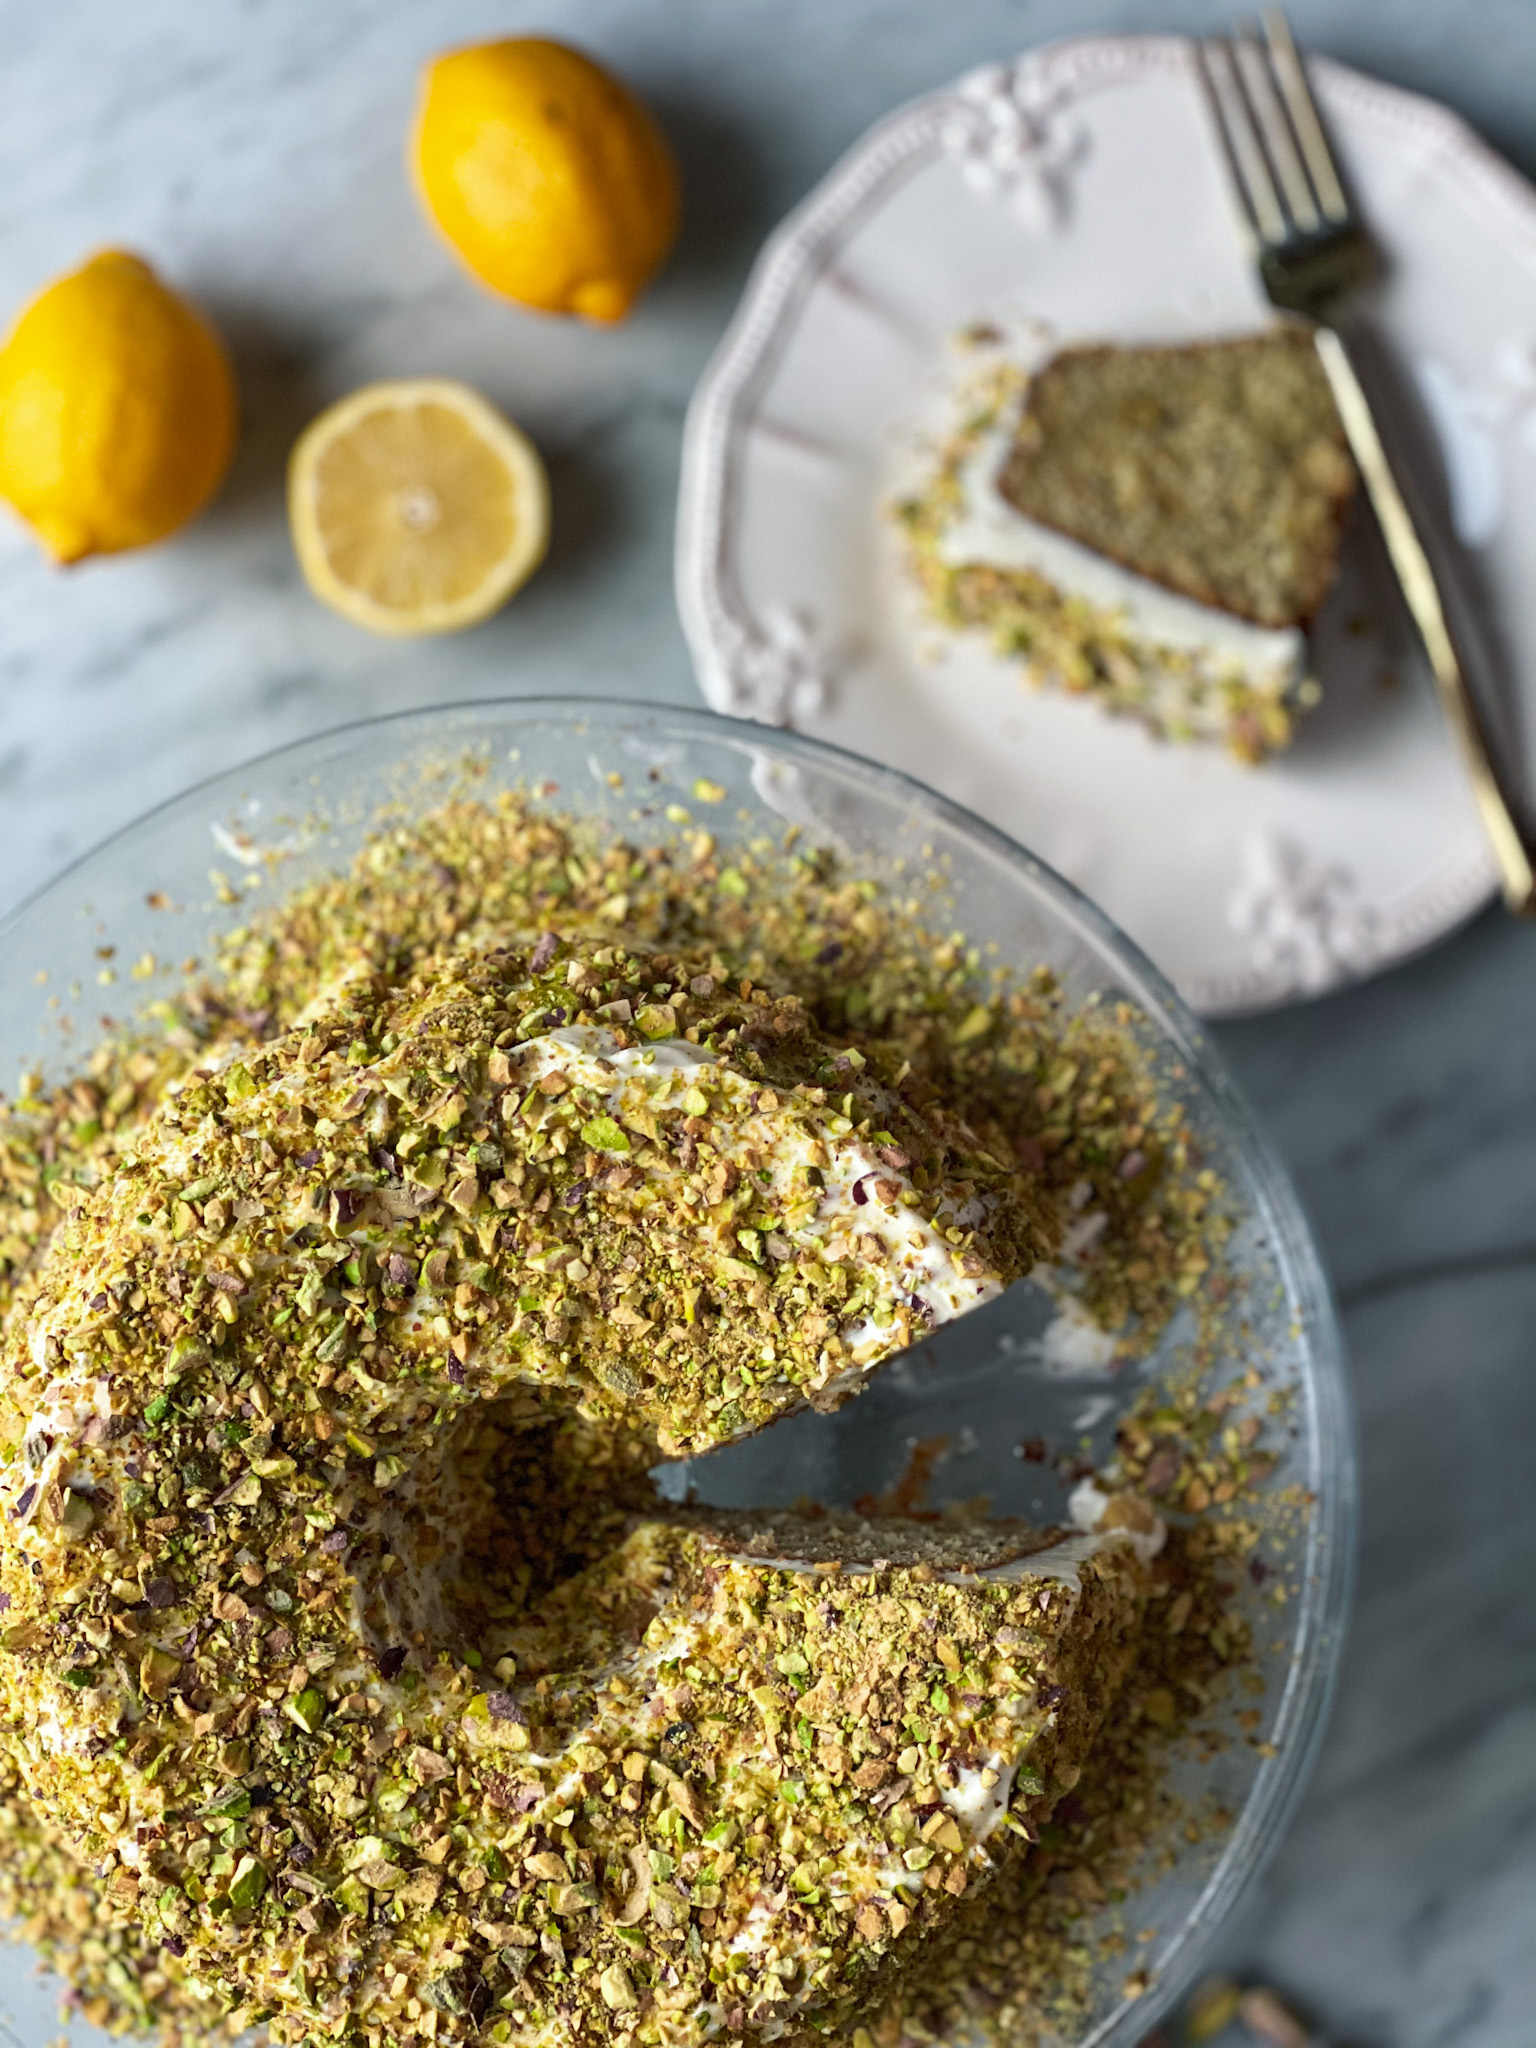 Lemon bundt cake with a slice of cake and some lemons